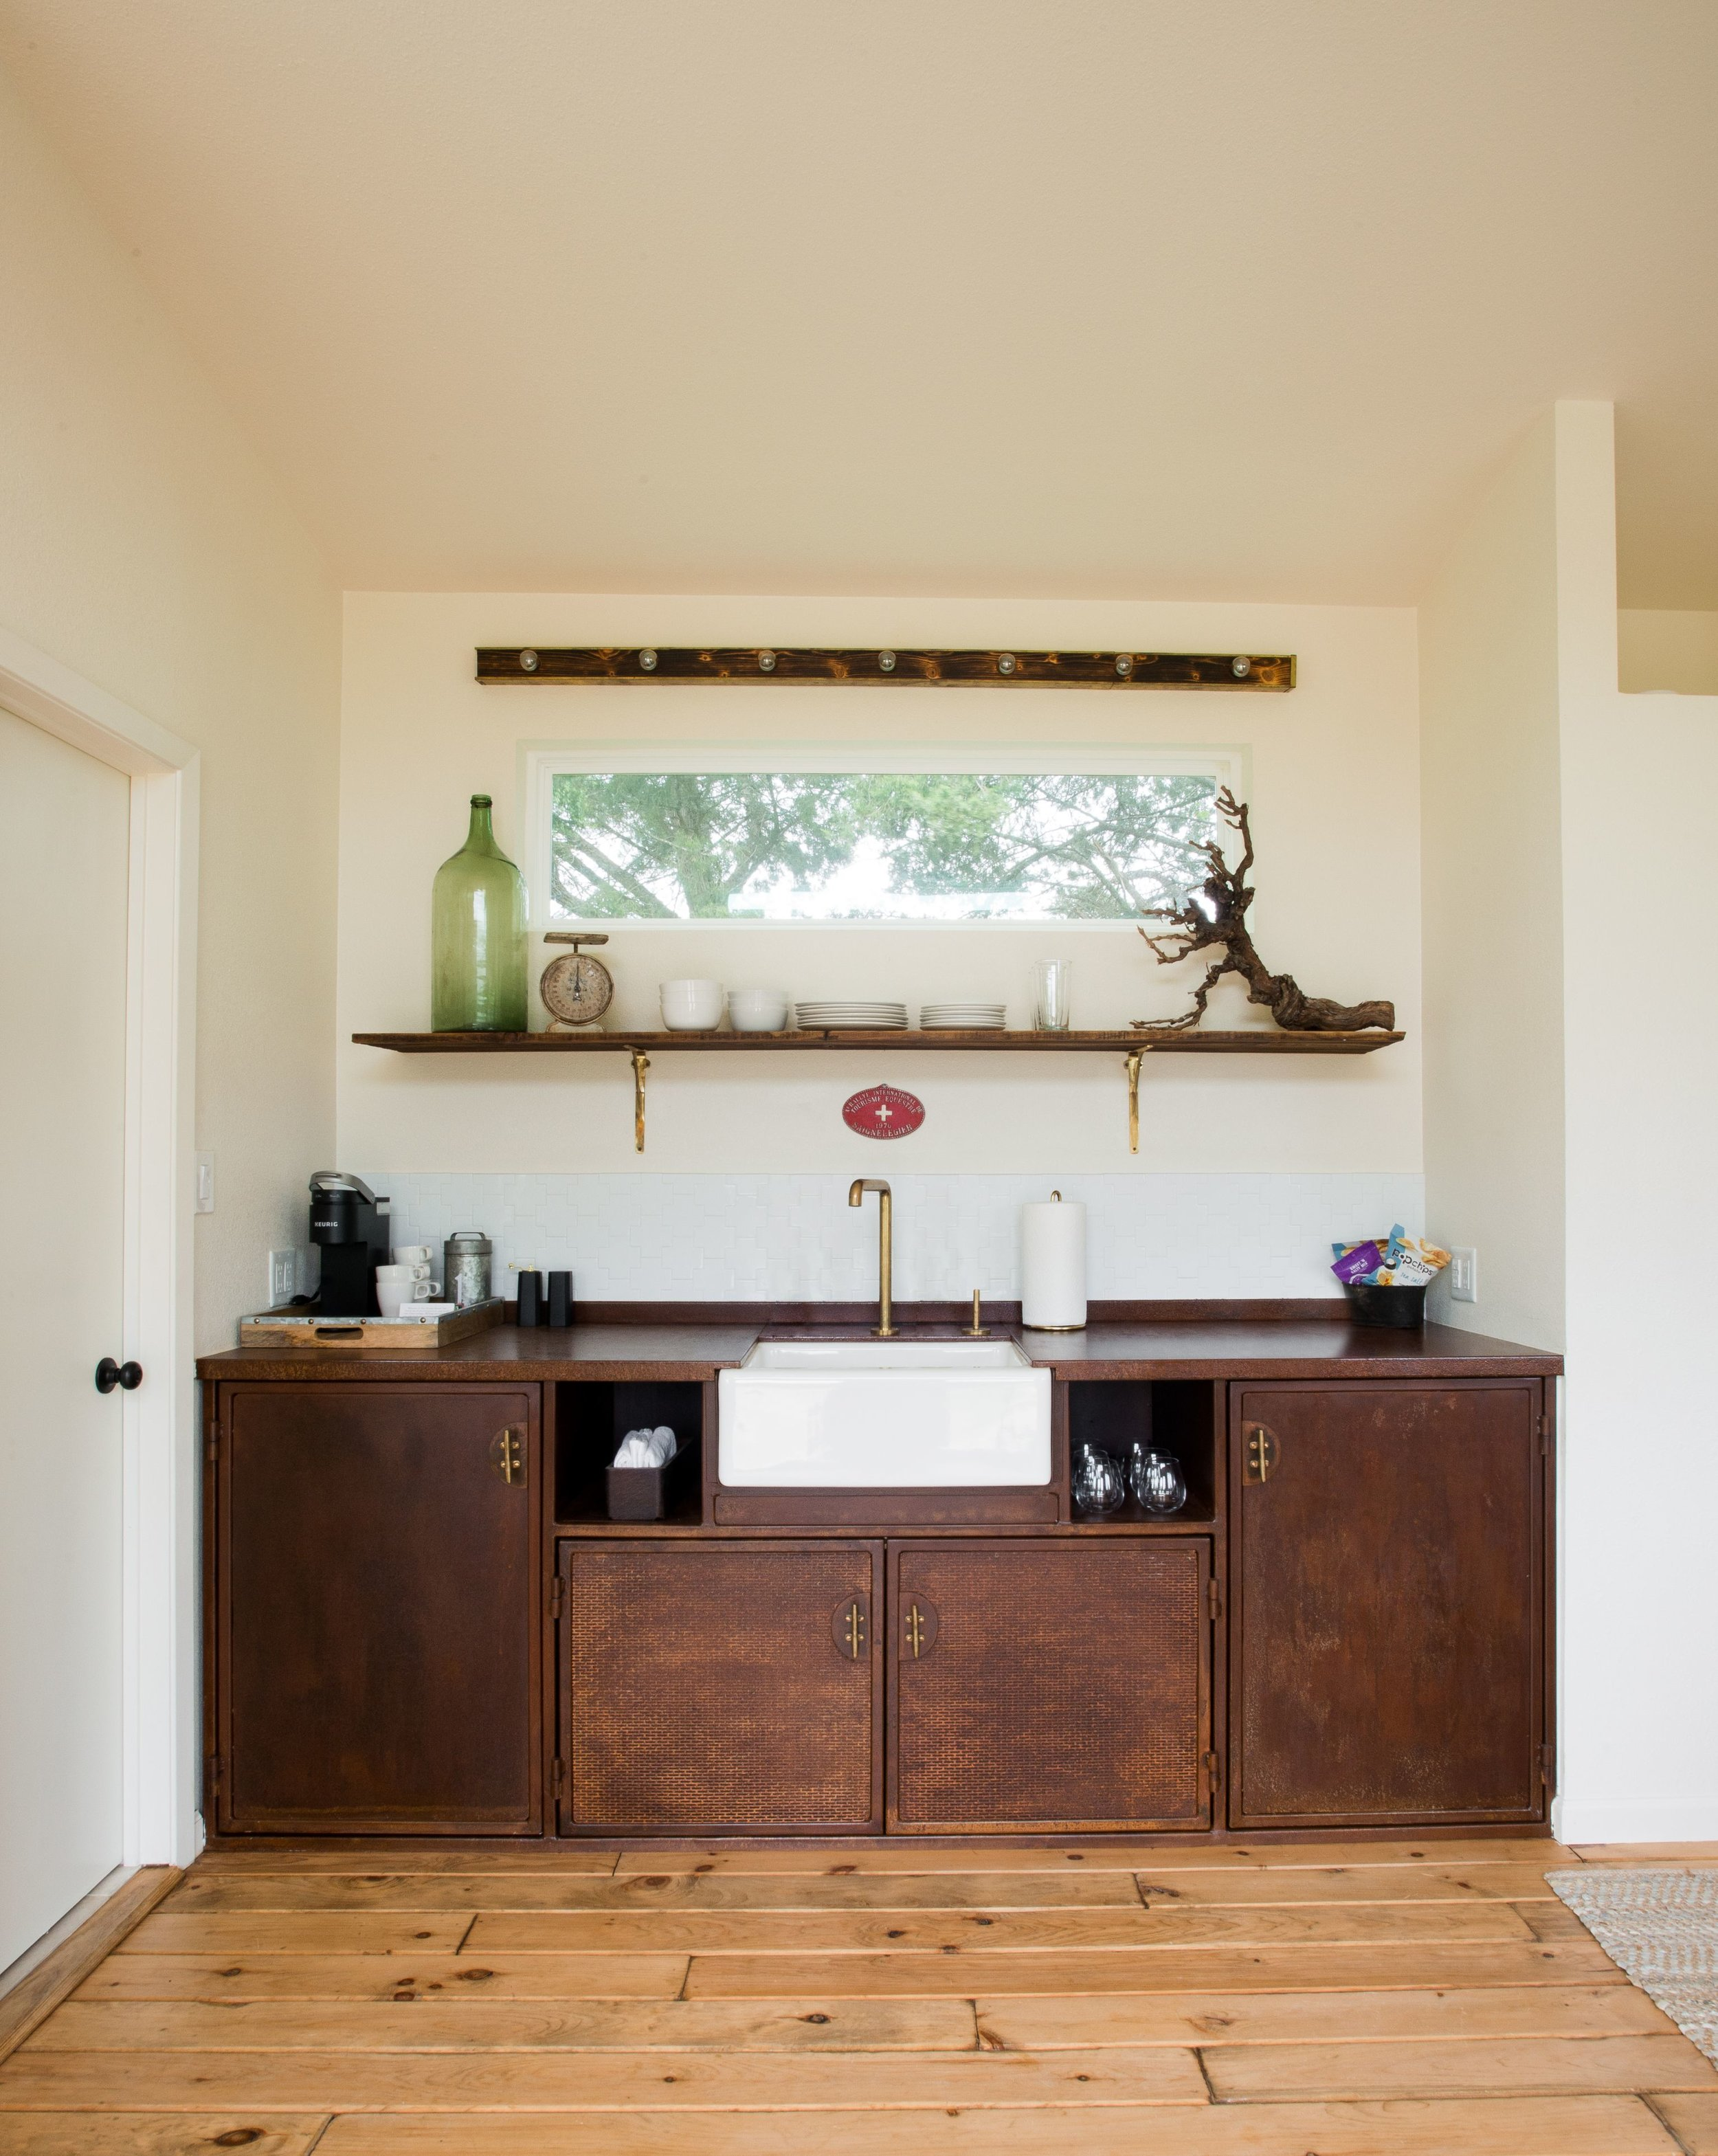 The Pierce kitchenette.